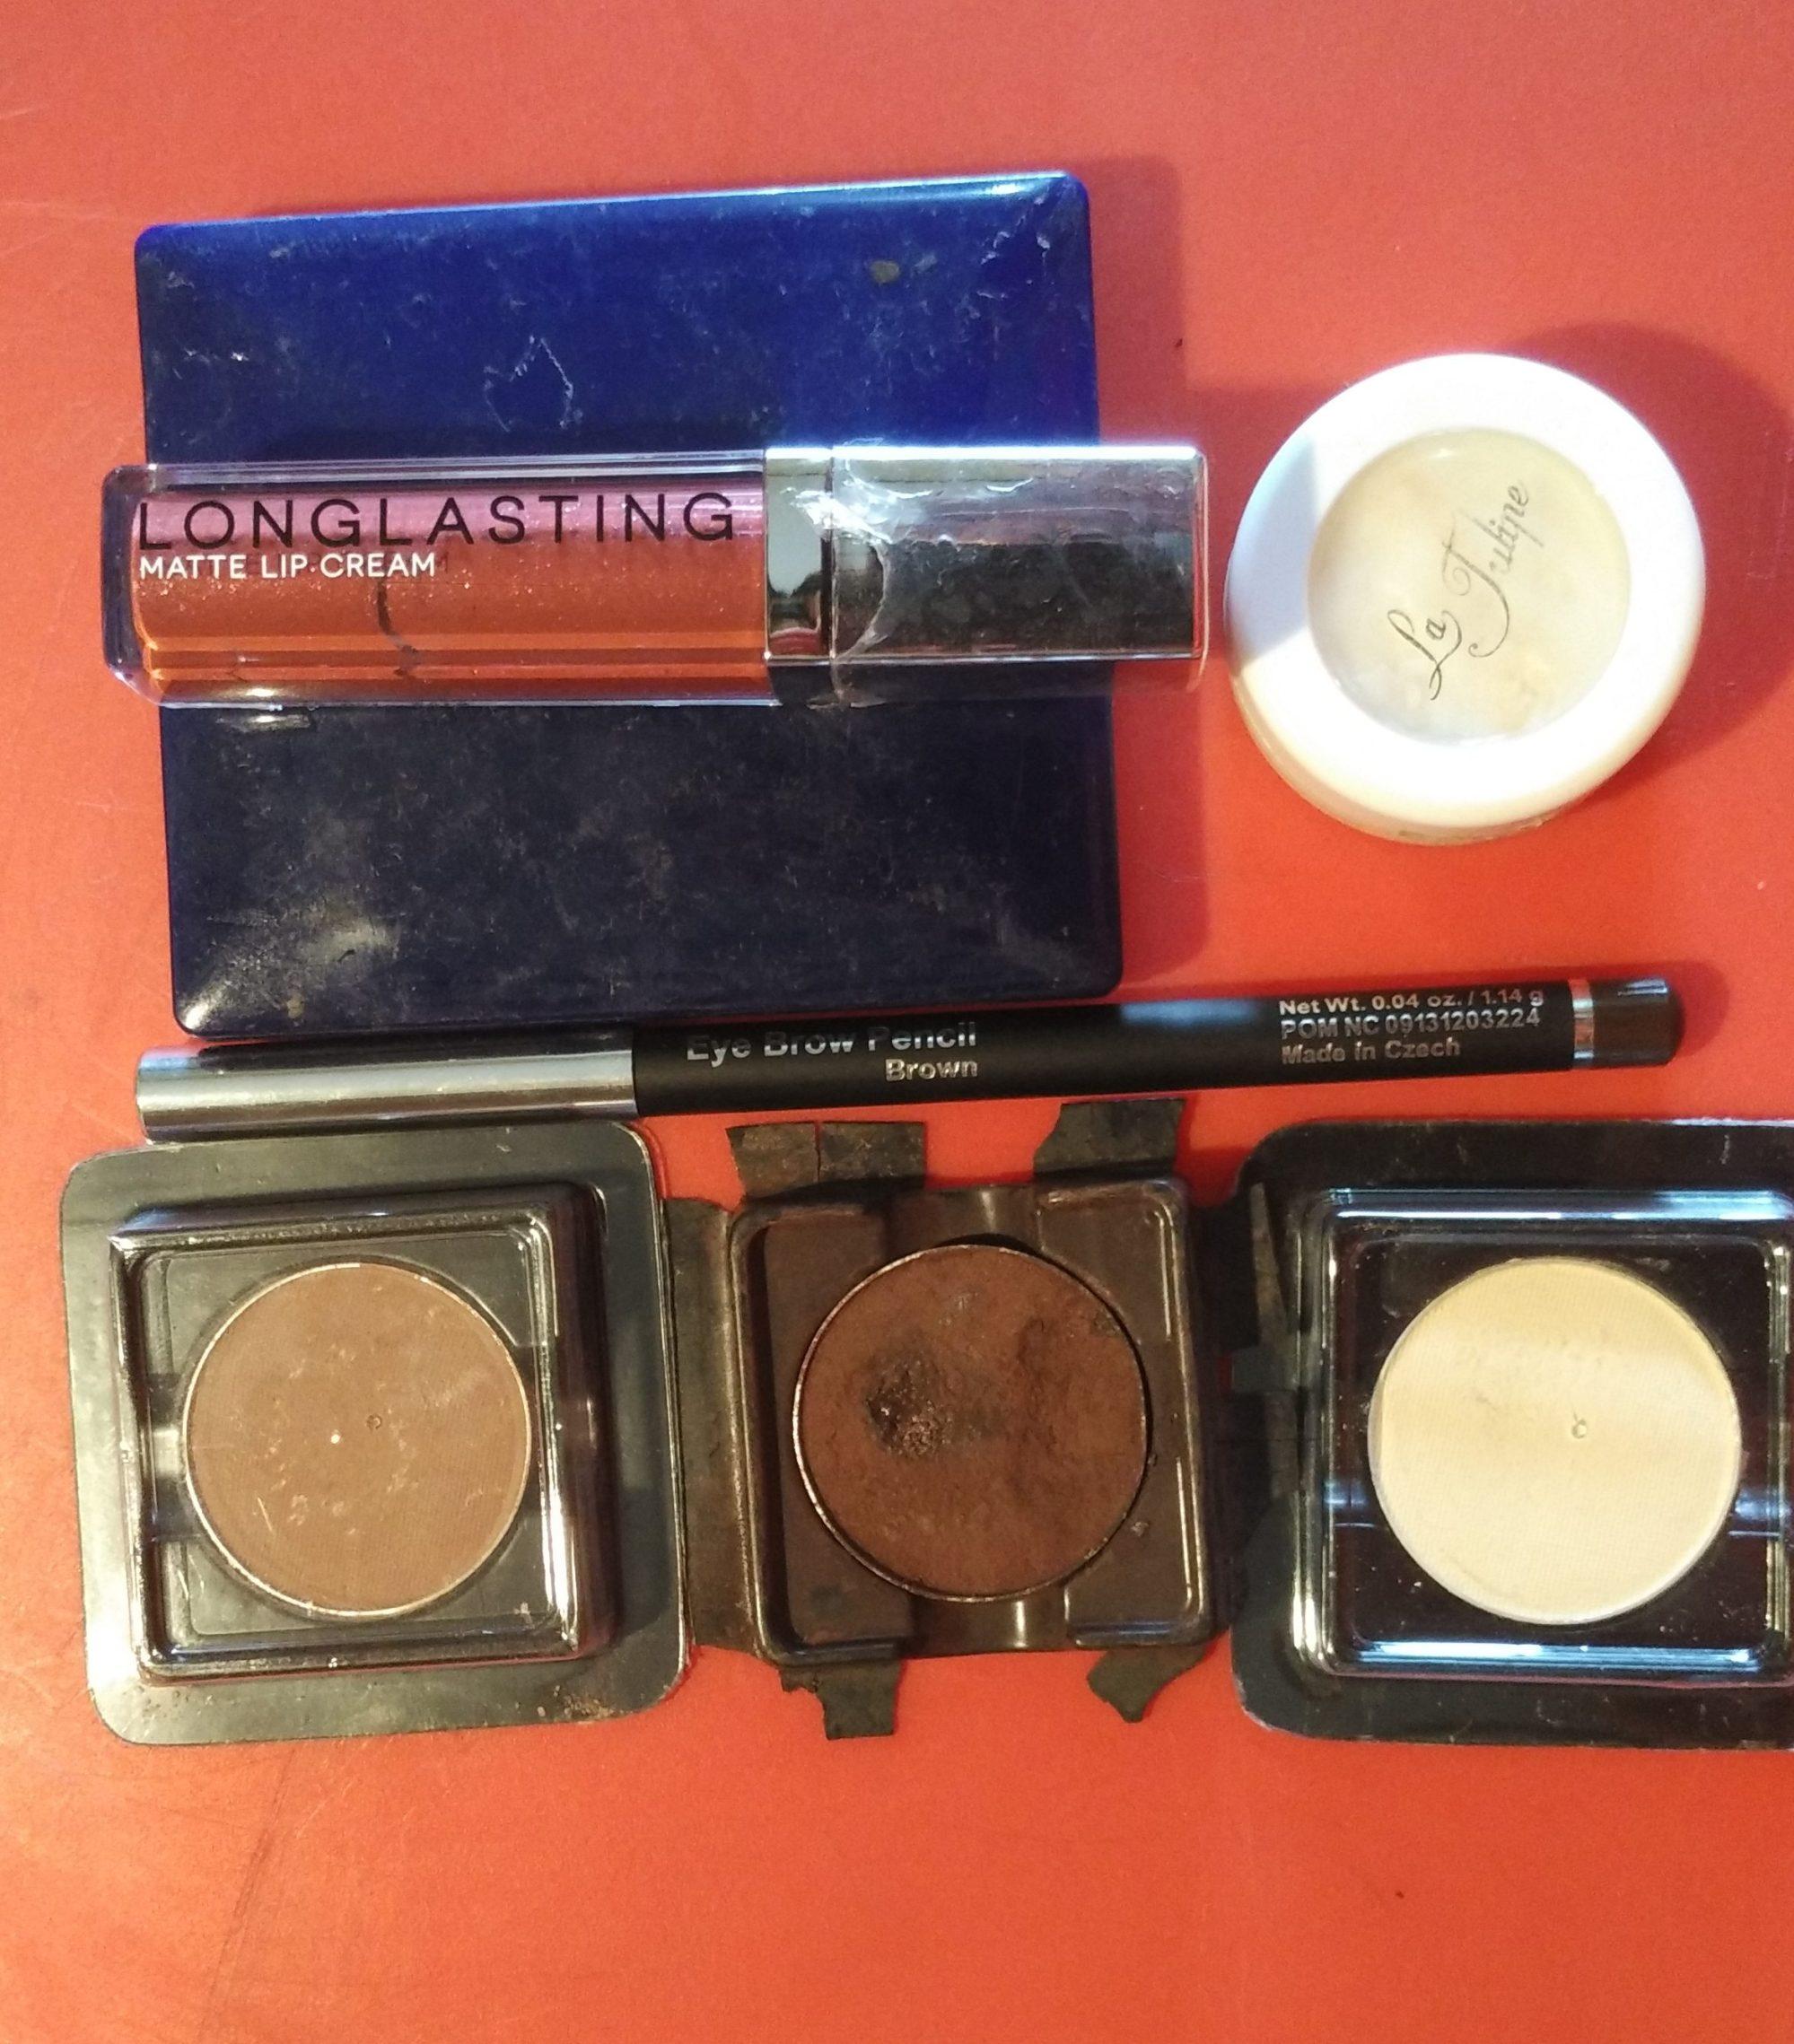 lt-pro-eye-shadow-and-lipstick.jpg.jpeg